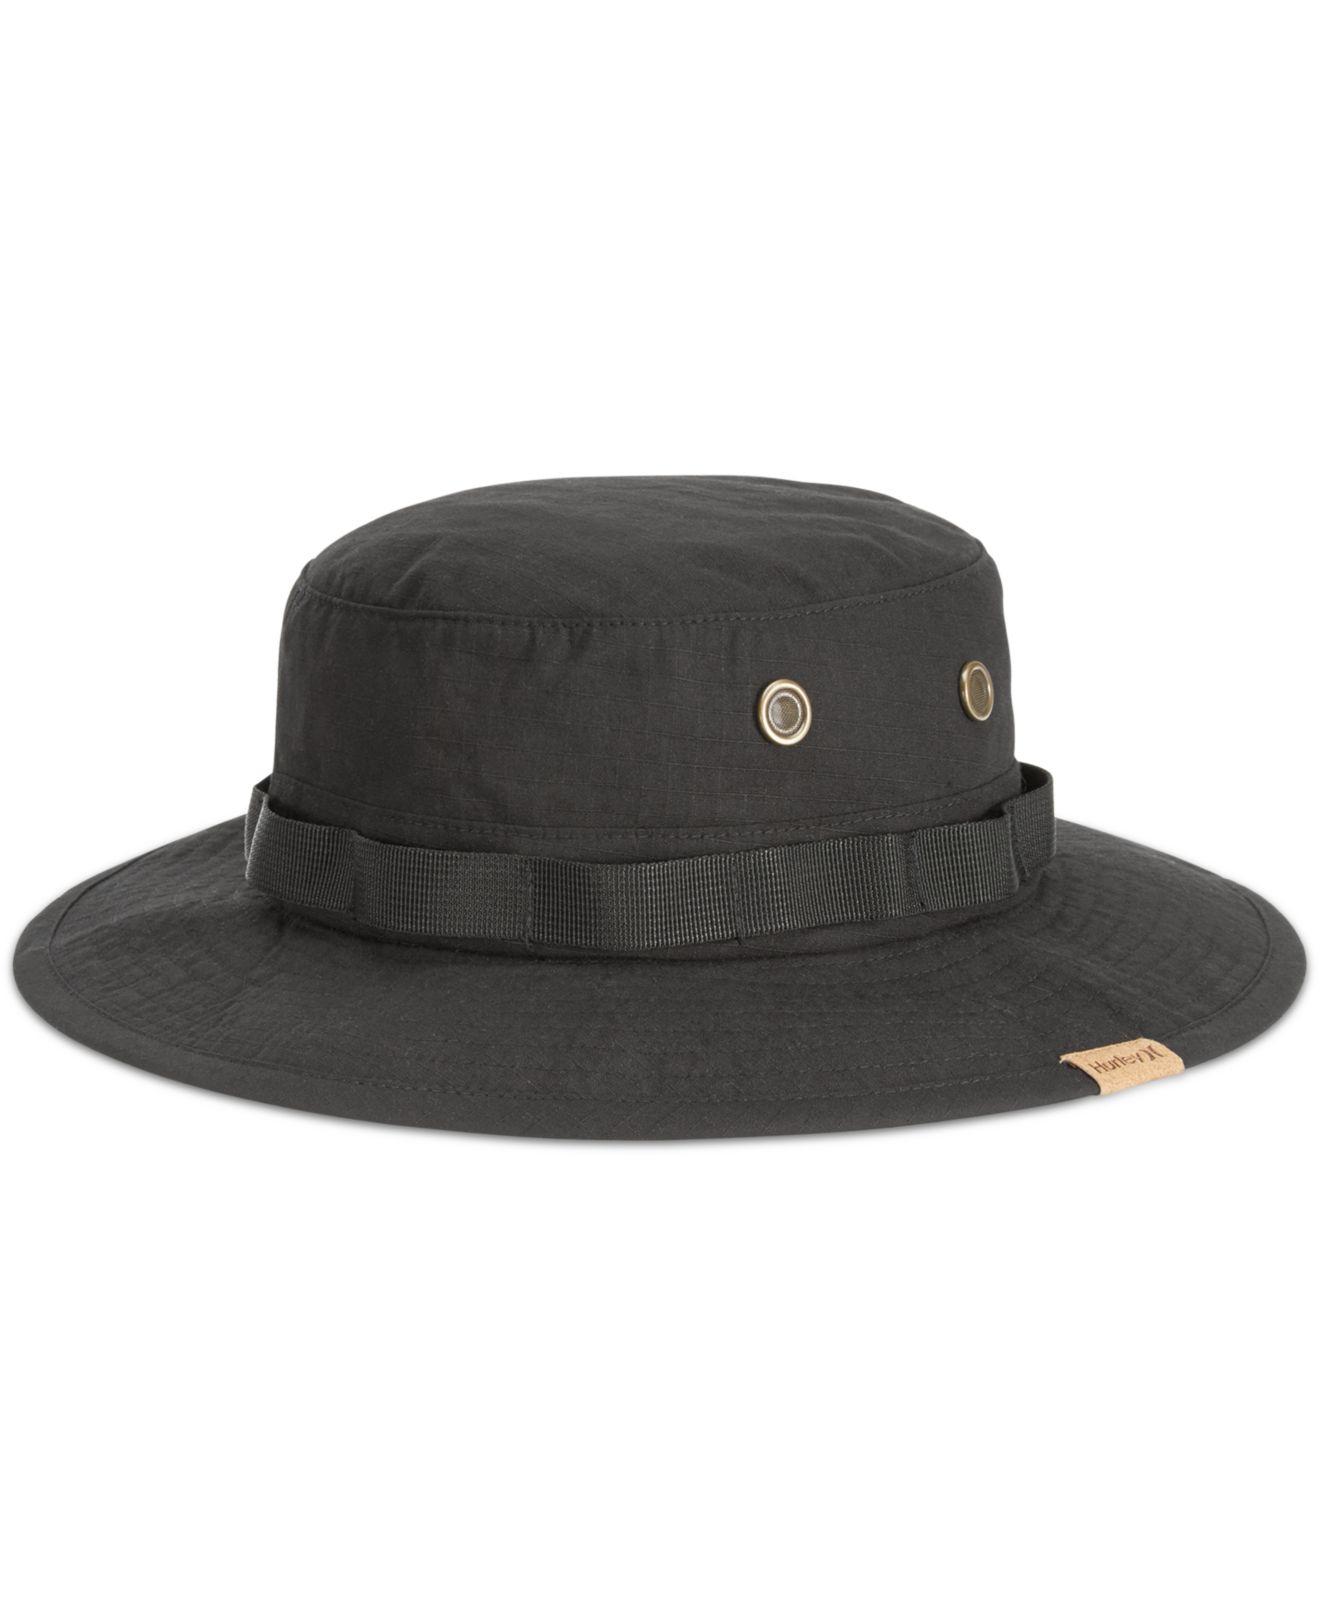 cd61ffdd8650d ... discount code for lyst hurley safari bucket hat in black for men abef2  79b4d